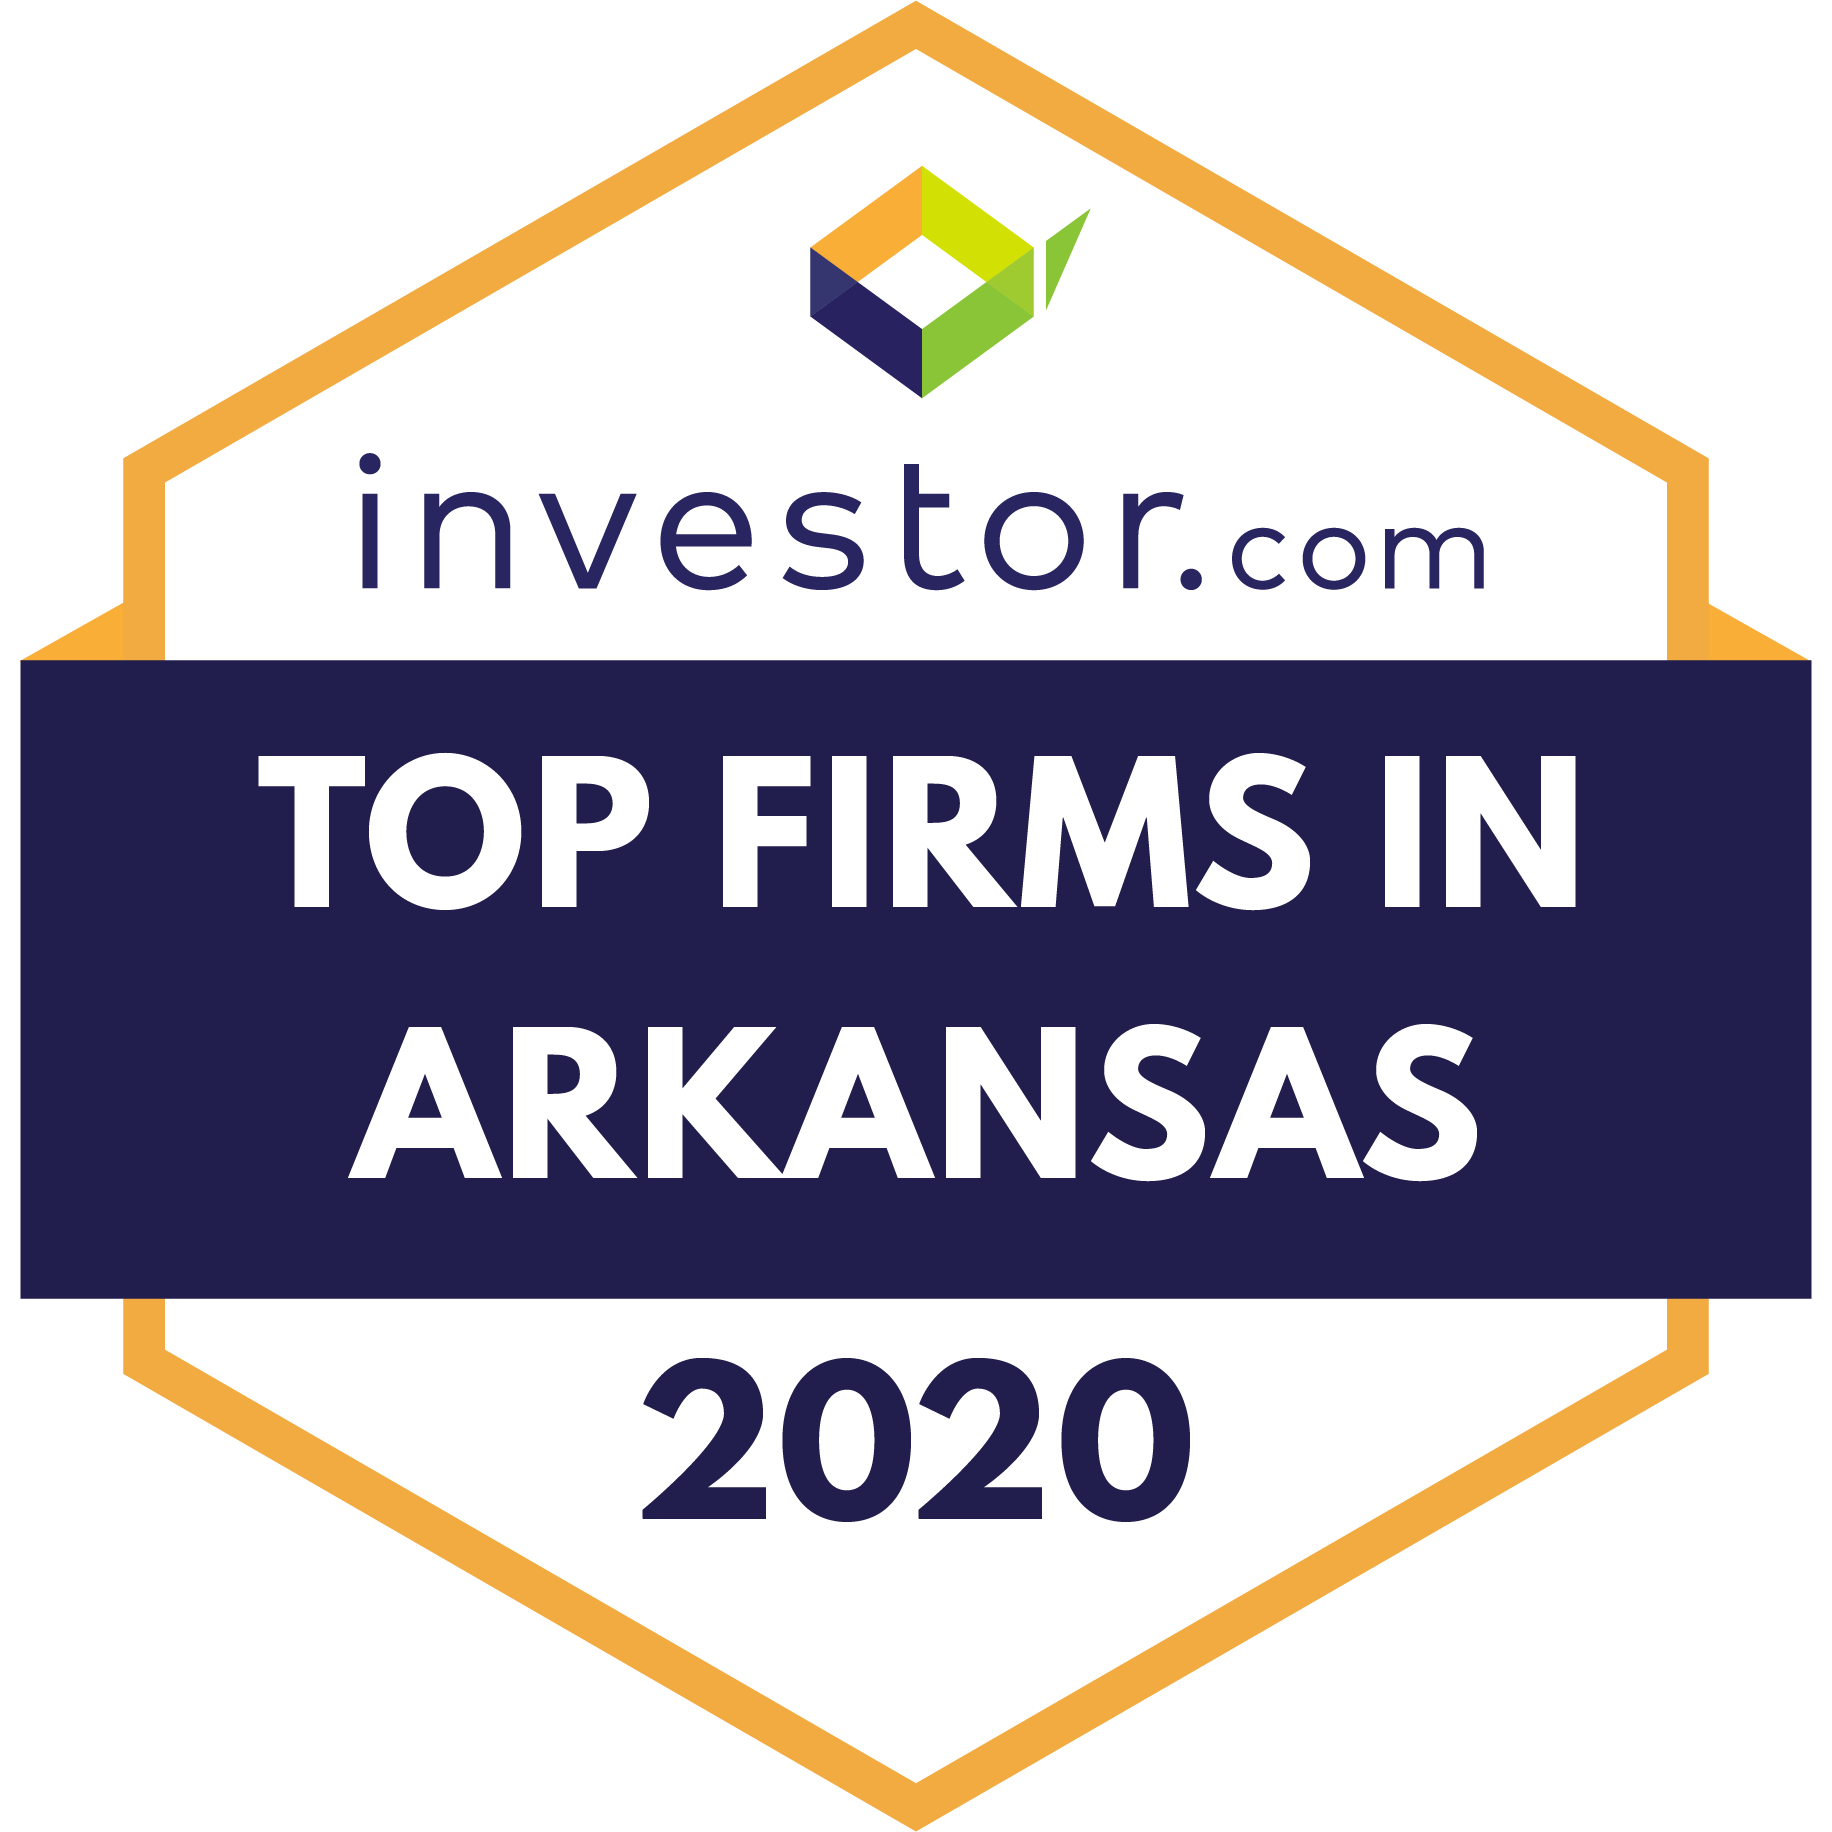 Inverstor.com Top Firms In Arkansas